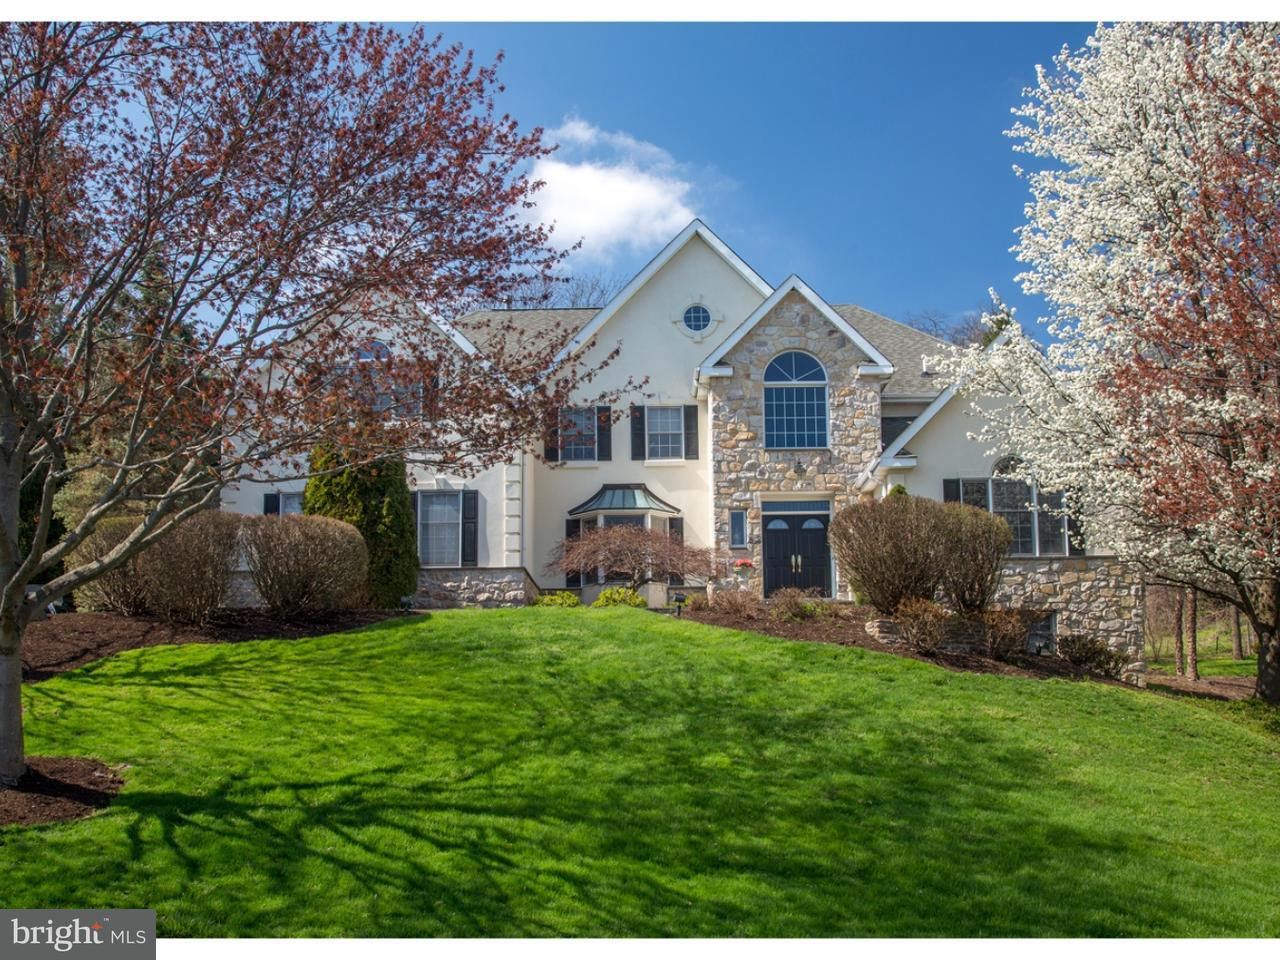 Single Family Home for Sale at 1212 GULPH CREEK Drive Wayne, Pennsylvania 19087 United States